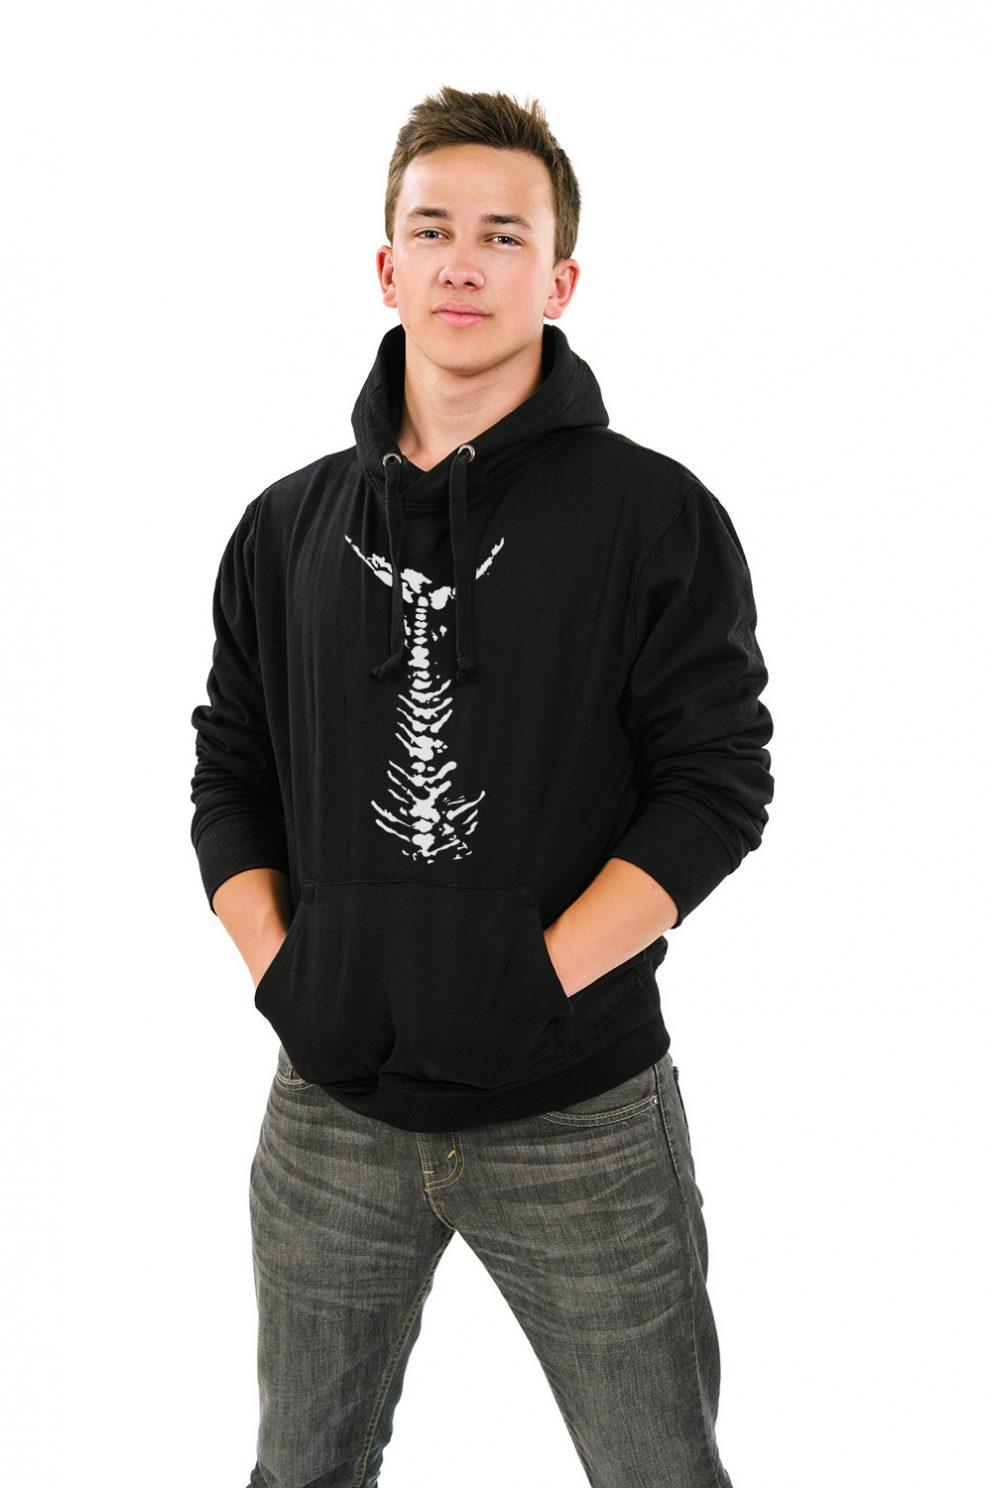 Kyst-shirt Olberg East Hoodie